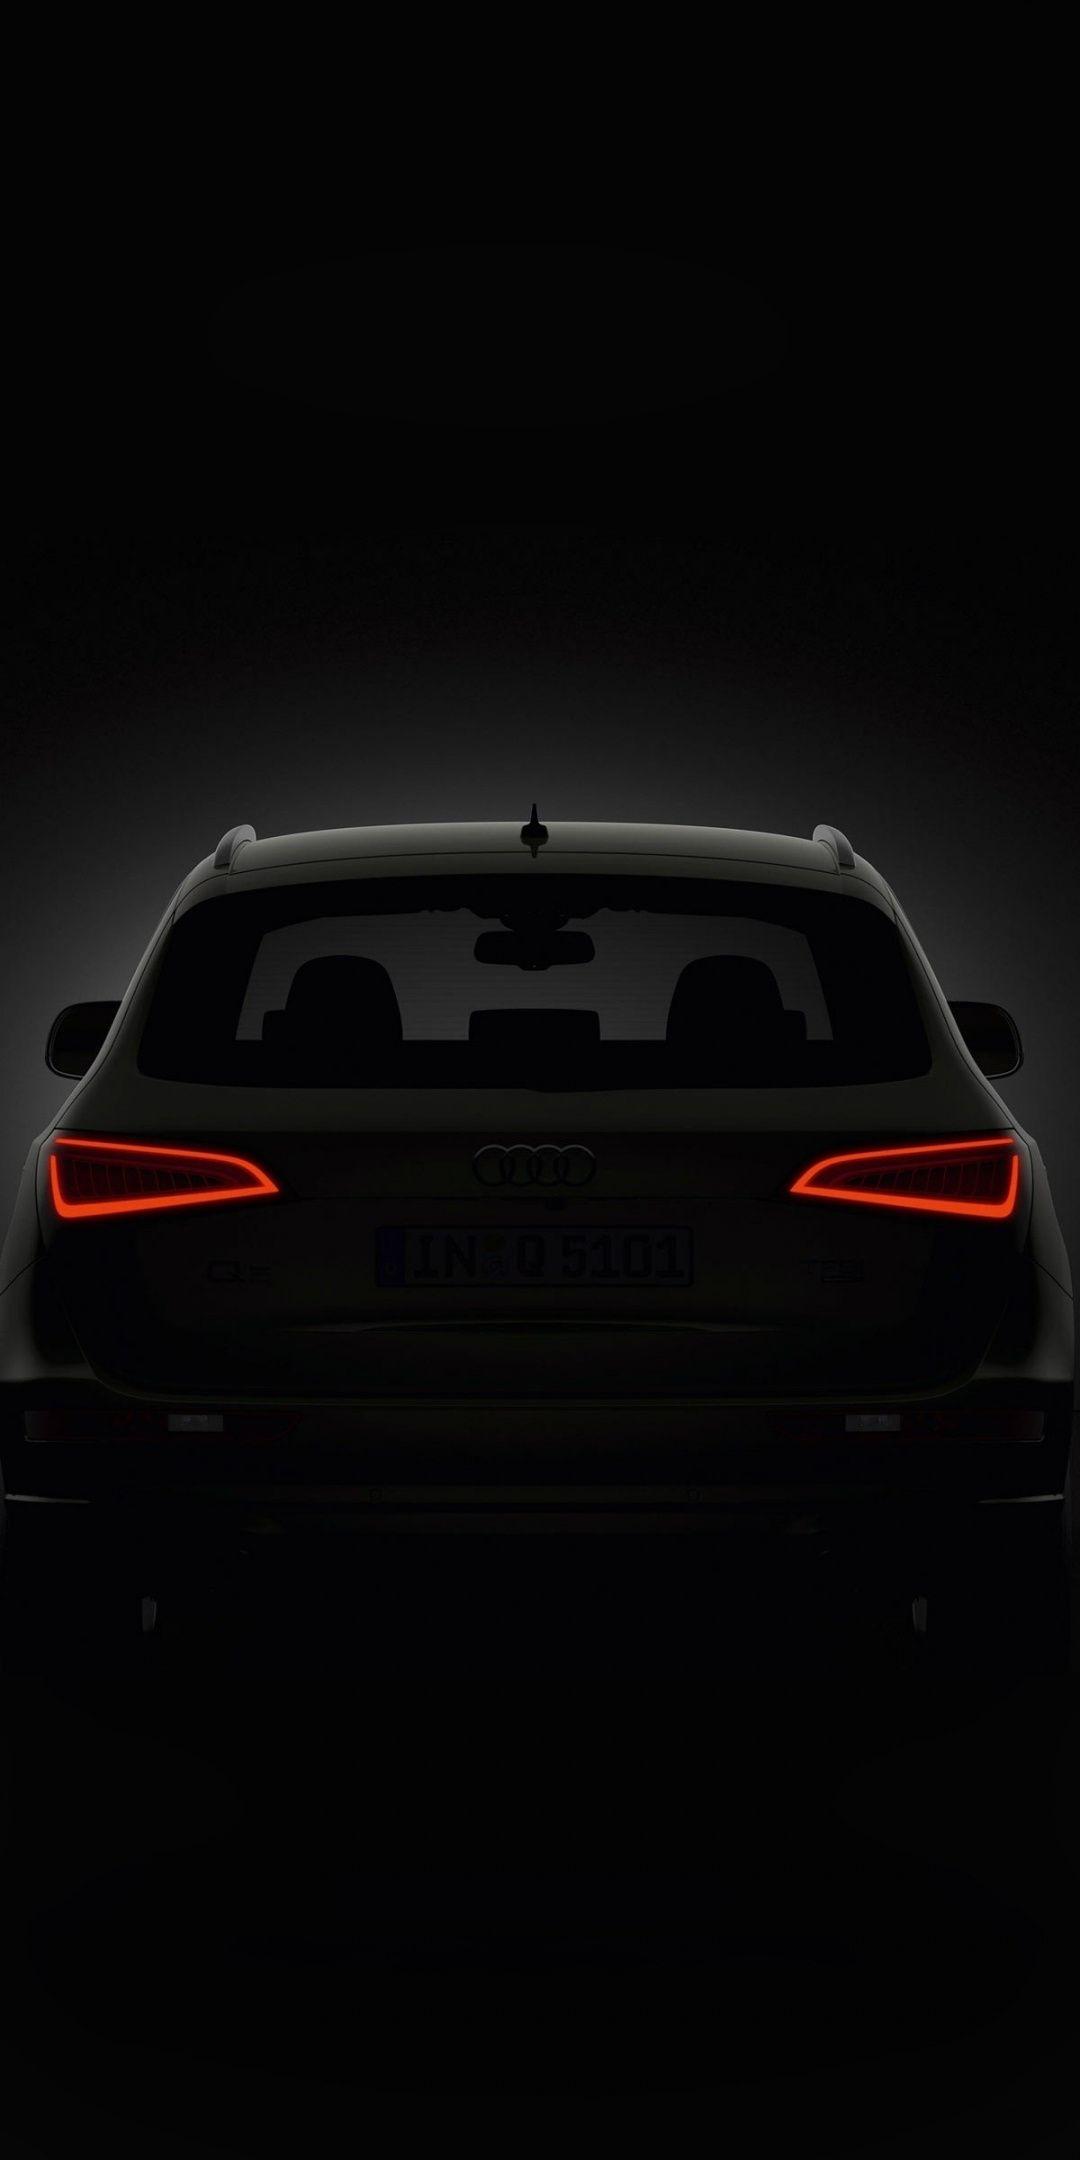 Audi Q5 Rear View Portrait 1080x2160 Wallpaper Audi Q5 Audi Car Wallpapers